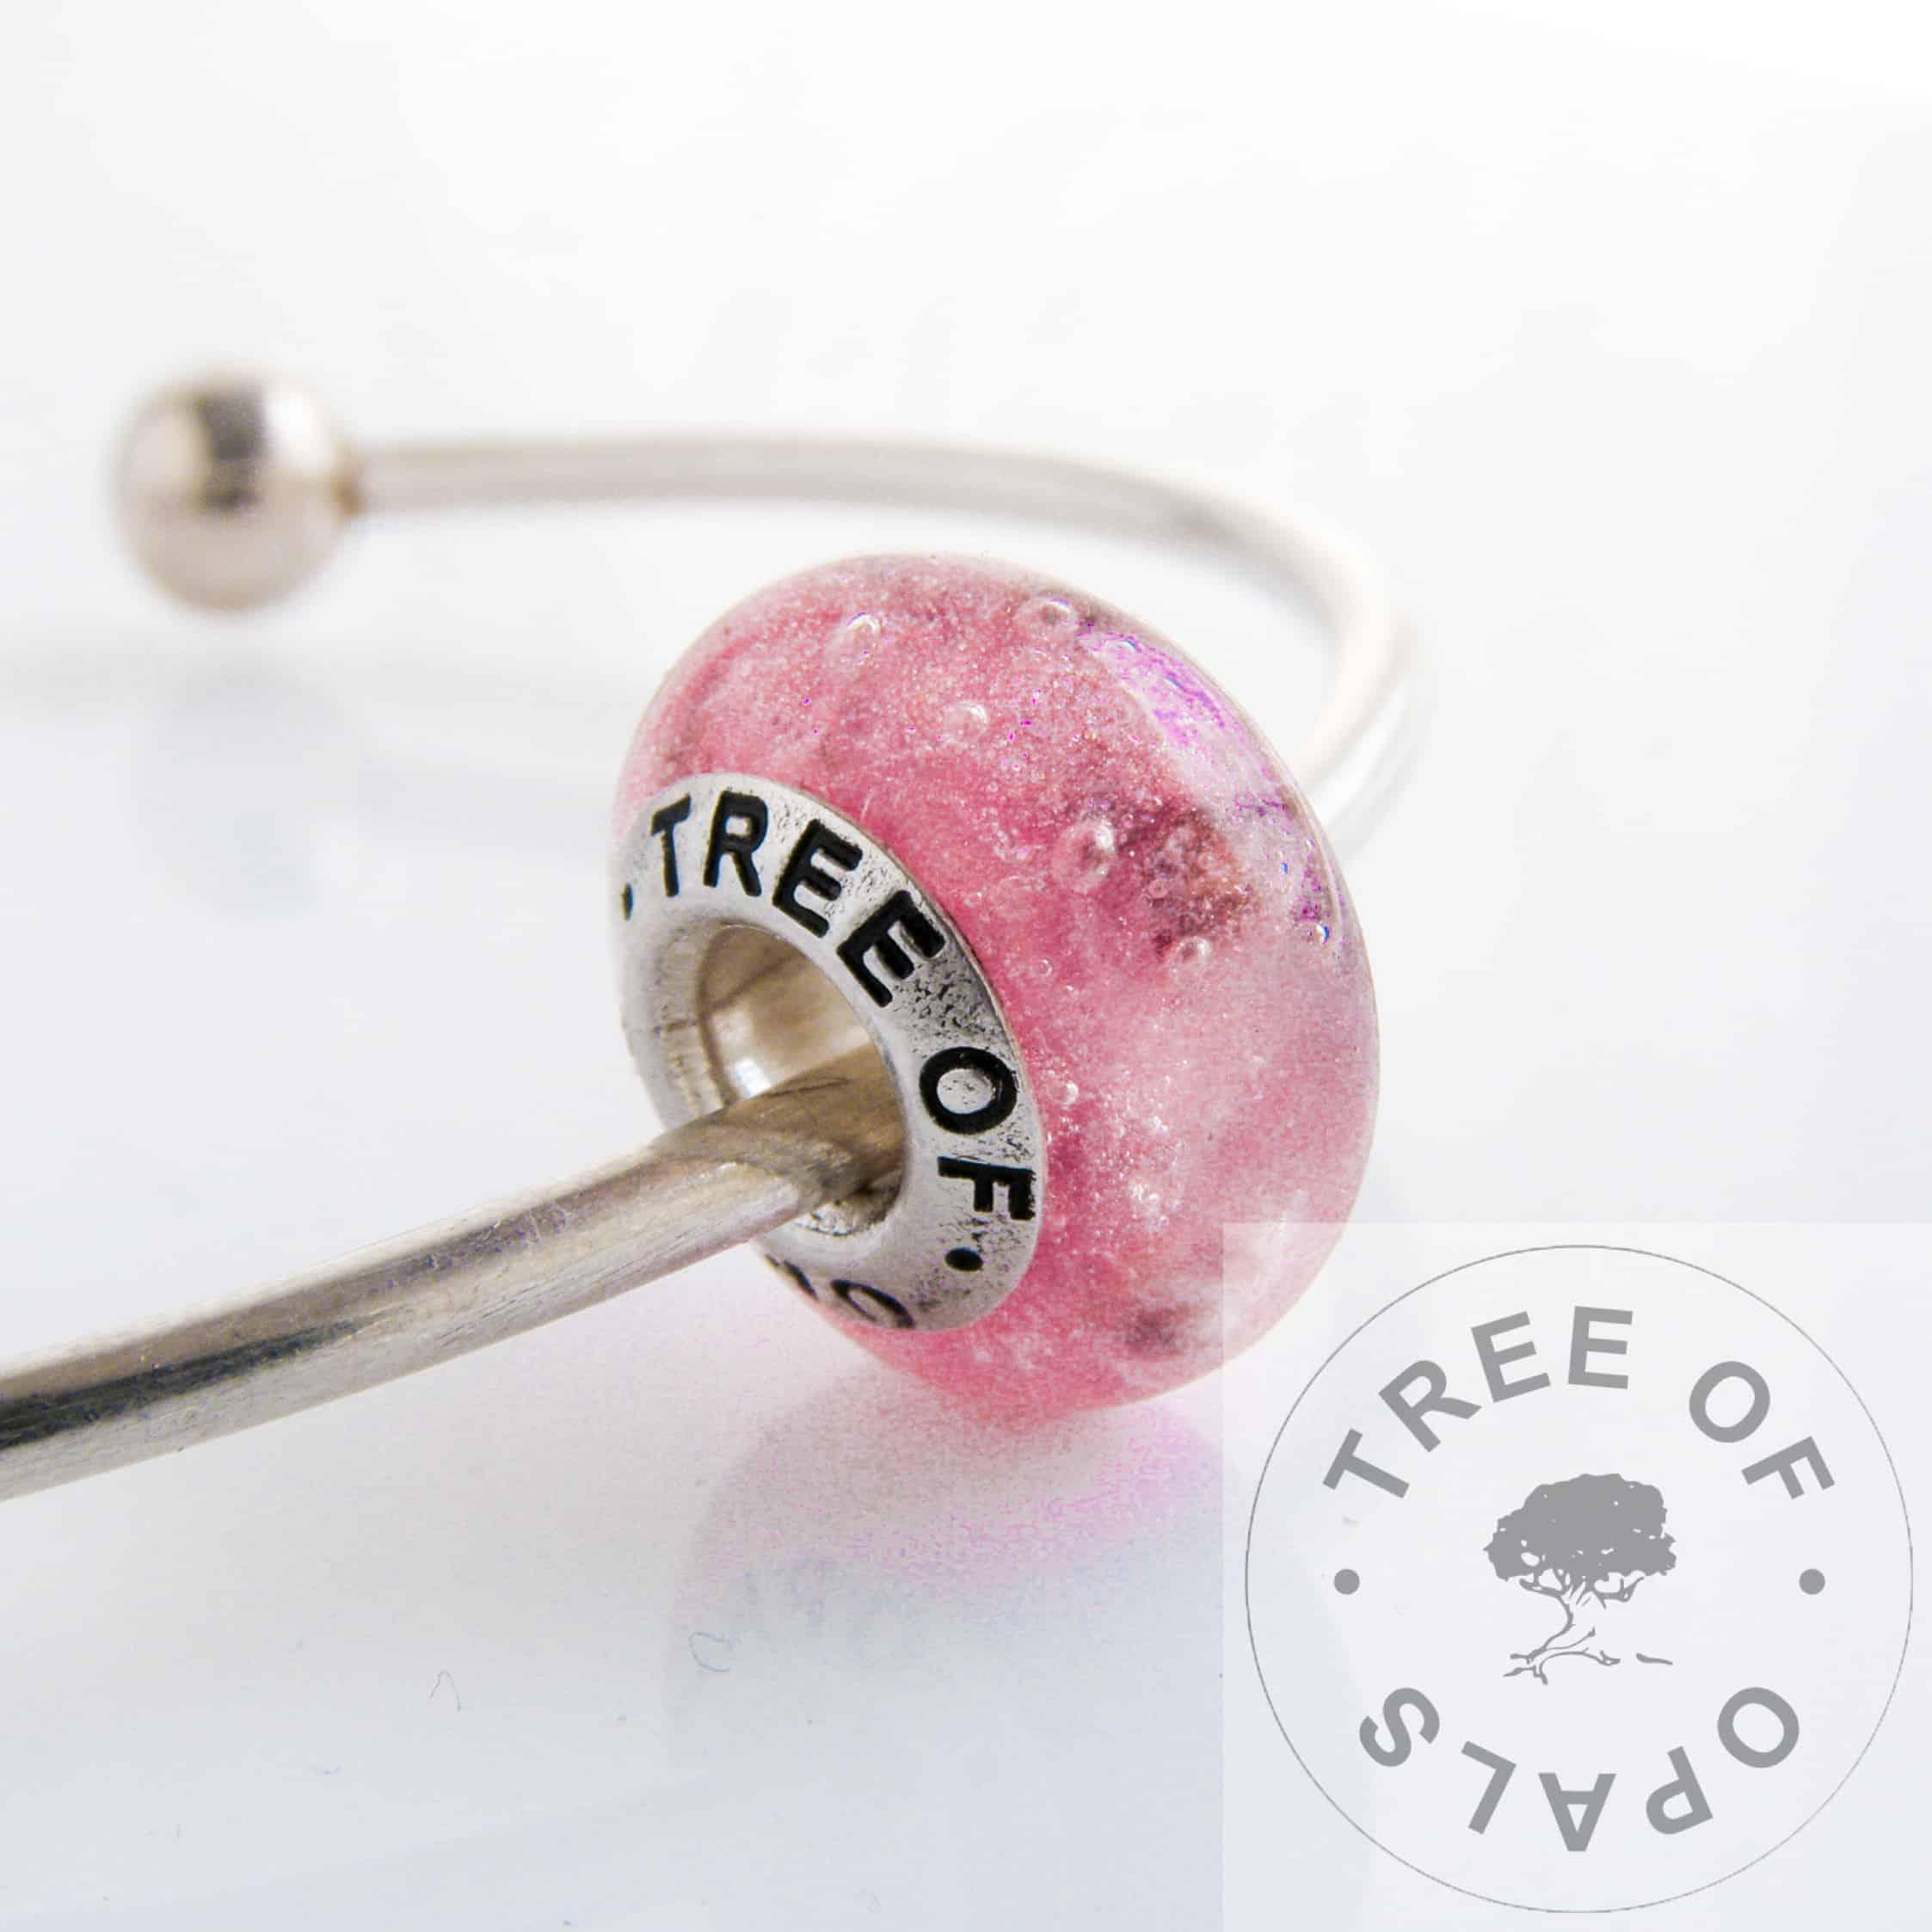 Tree of Opals keepsake jewellery 2017